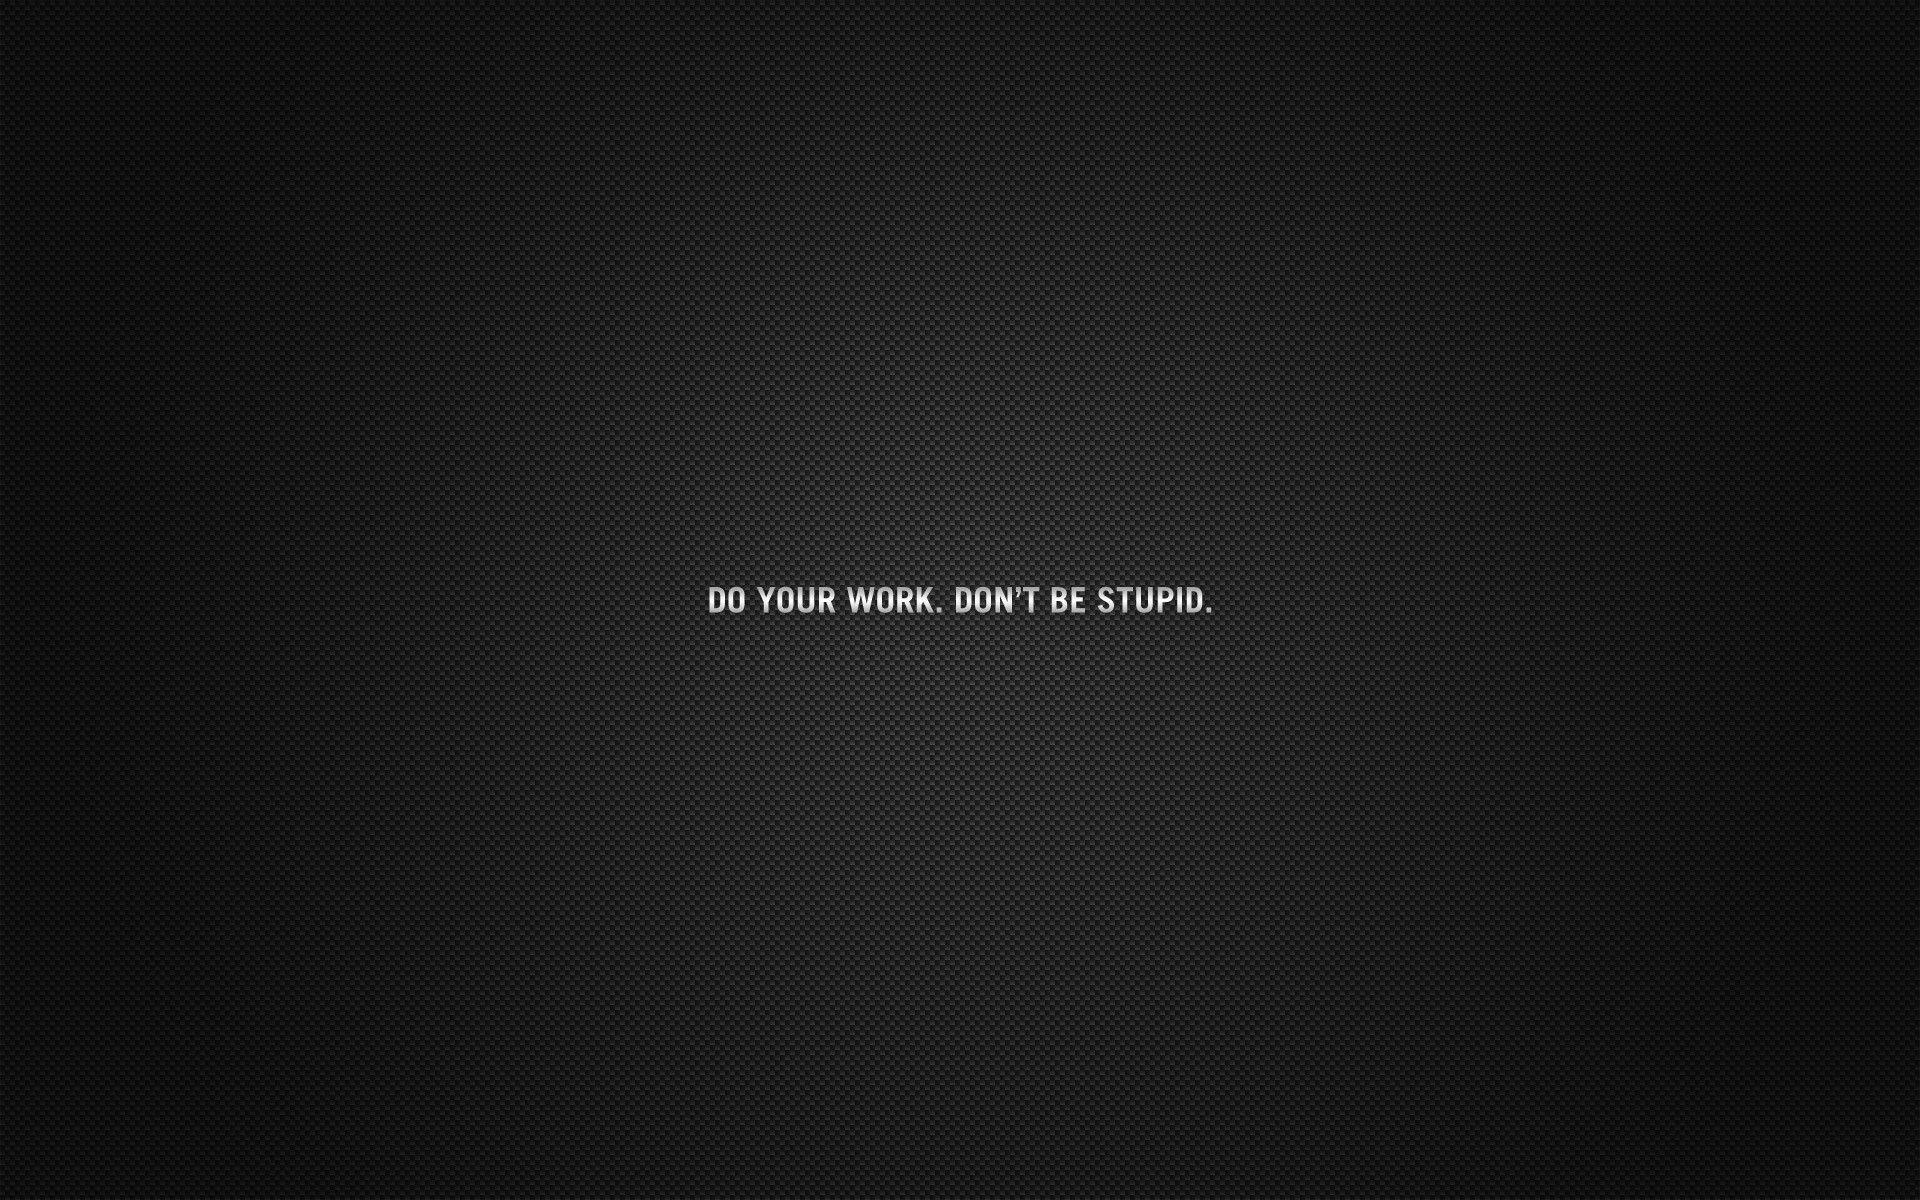 Quote Minimalism Typography Motivational Wallpaper Typography Wallpaper Do You Work Wallpaper Quotes